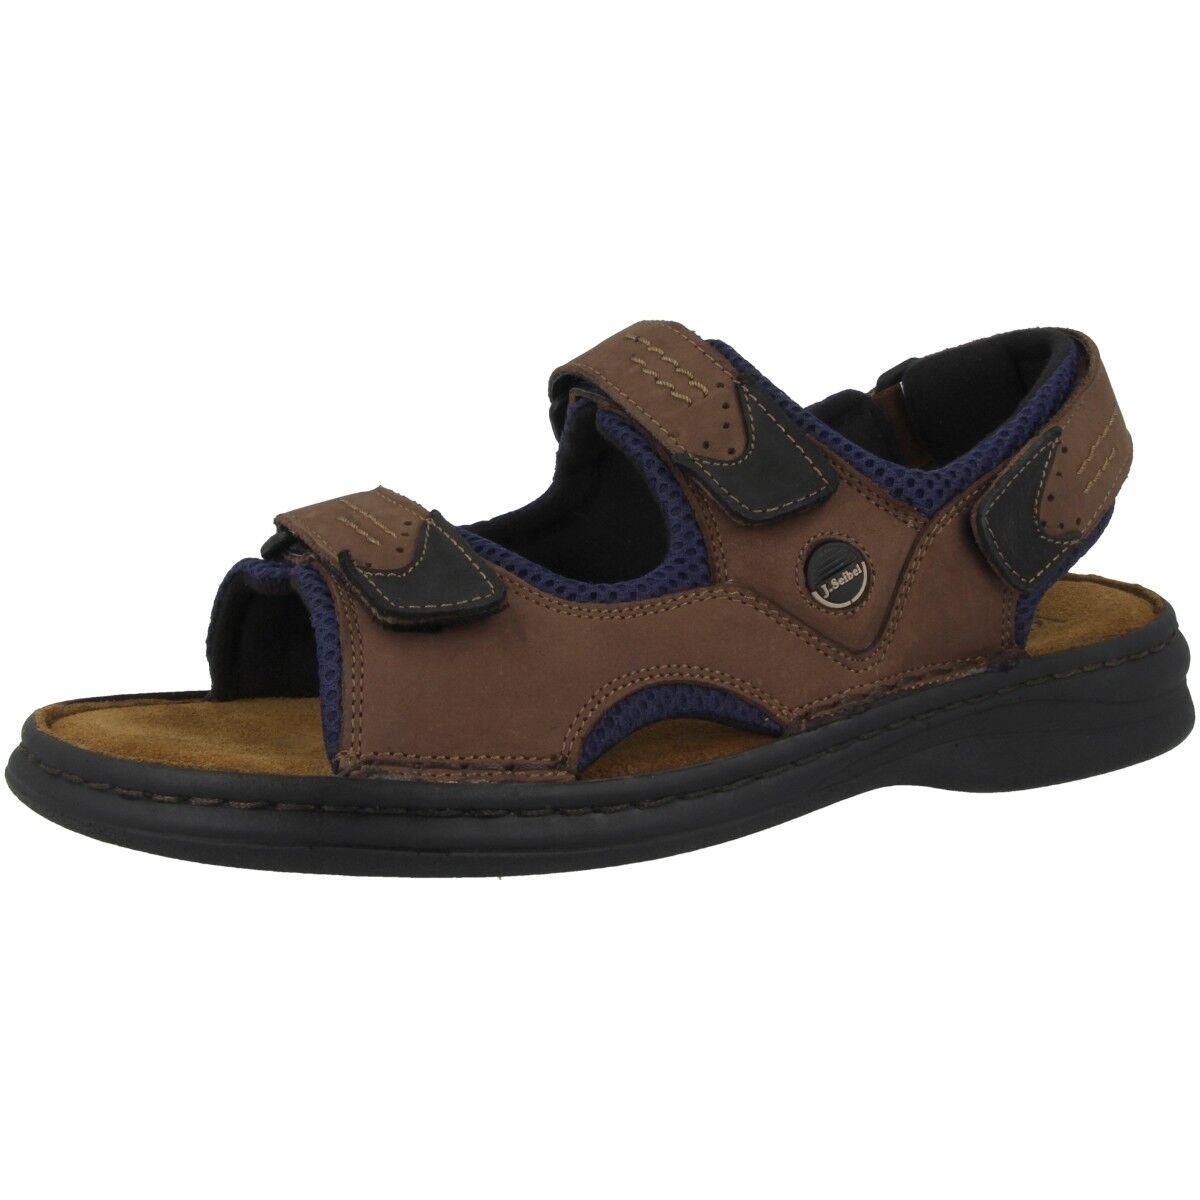 Josef Seibel Franklyn shoes men Comfort Trekking Sandali 10236-11-311